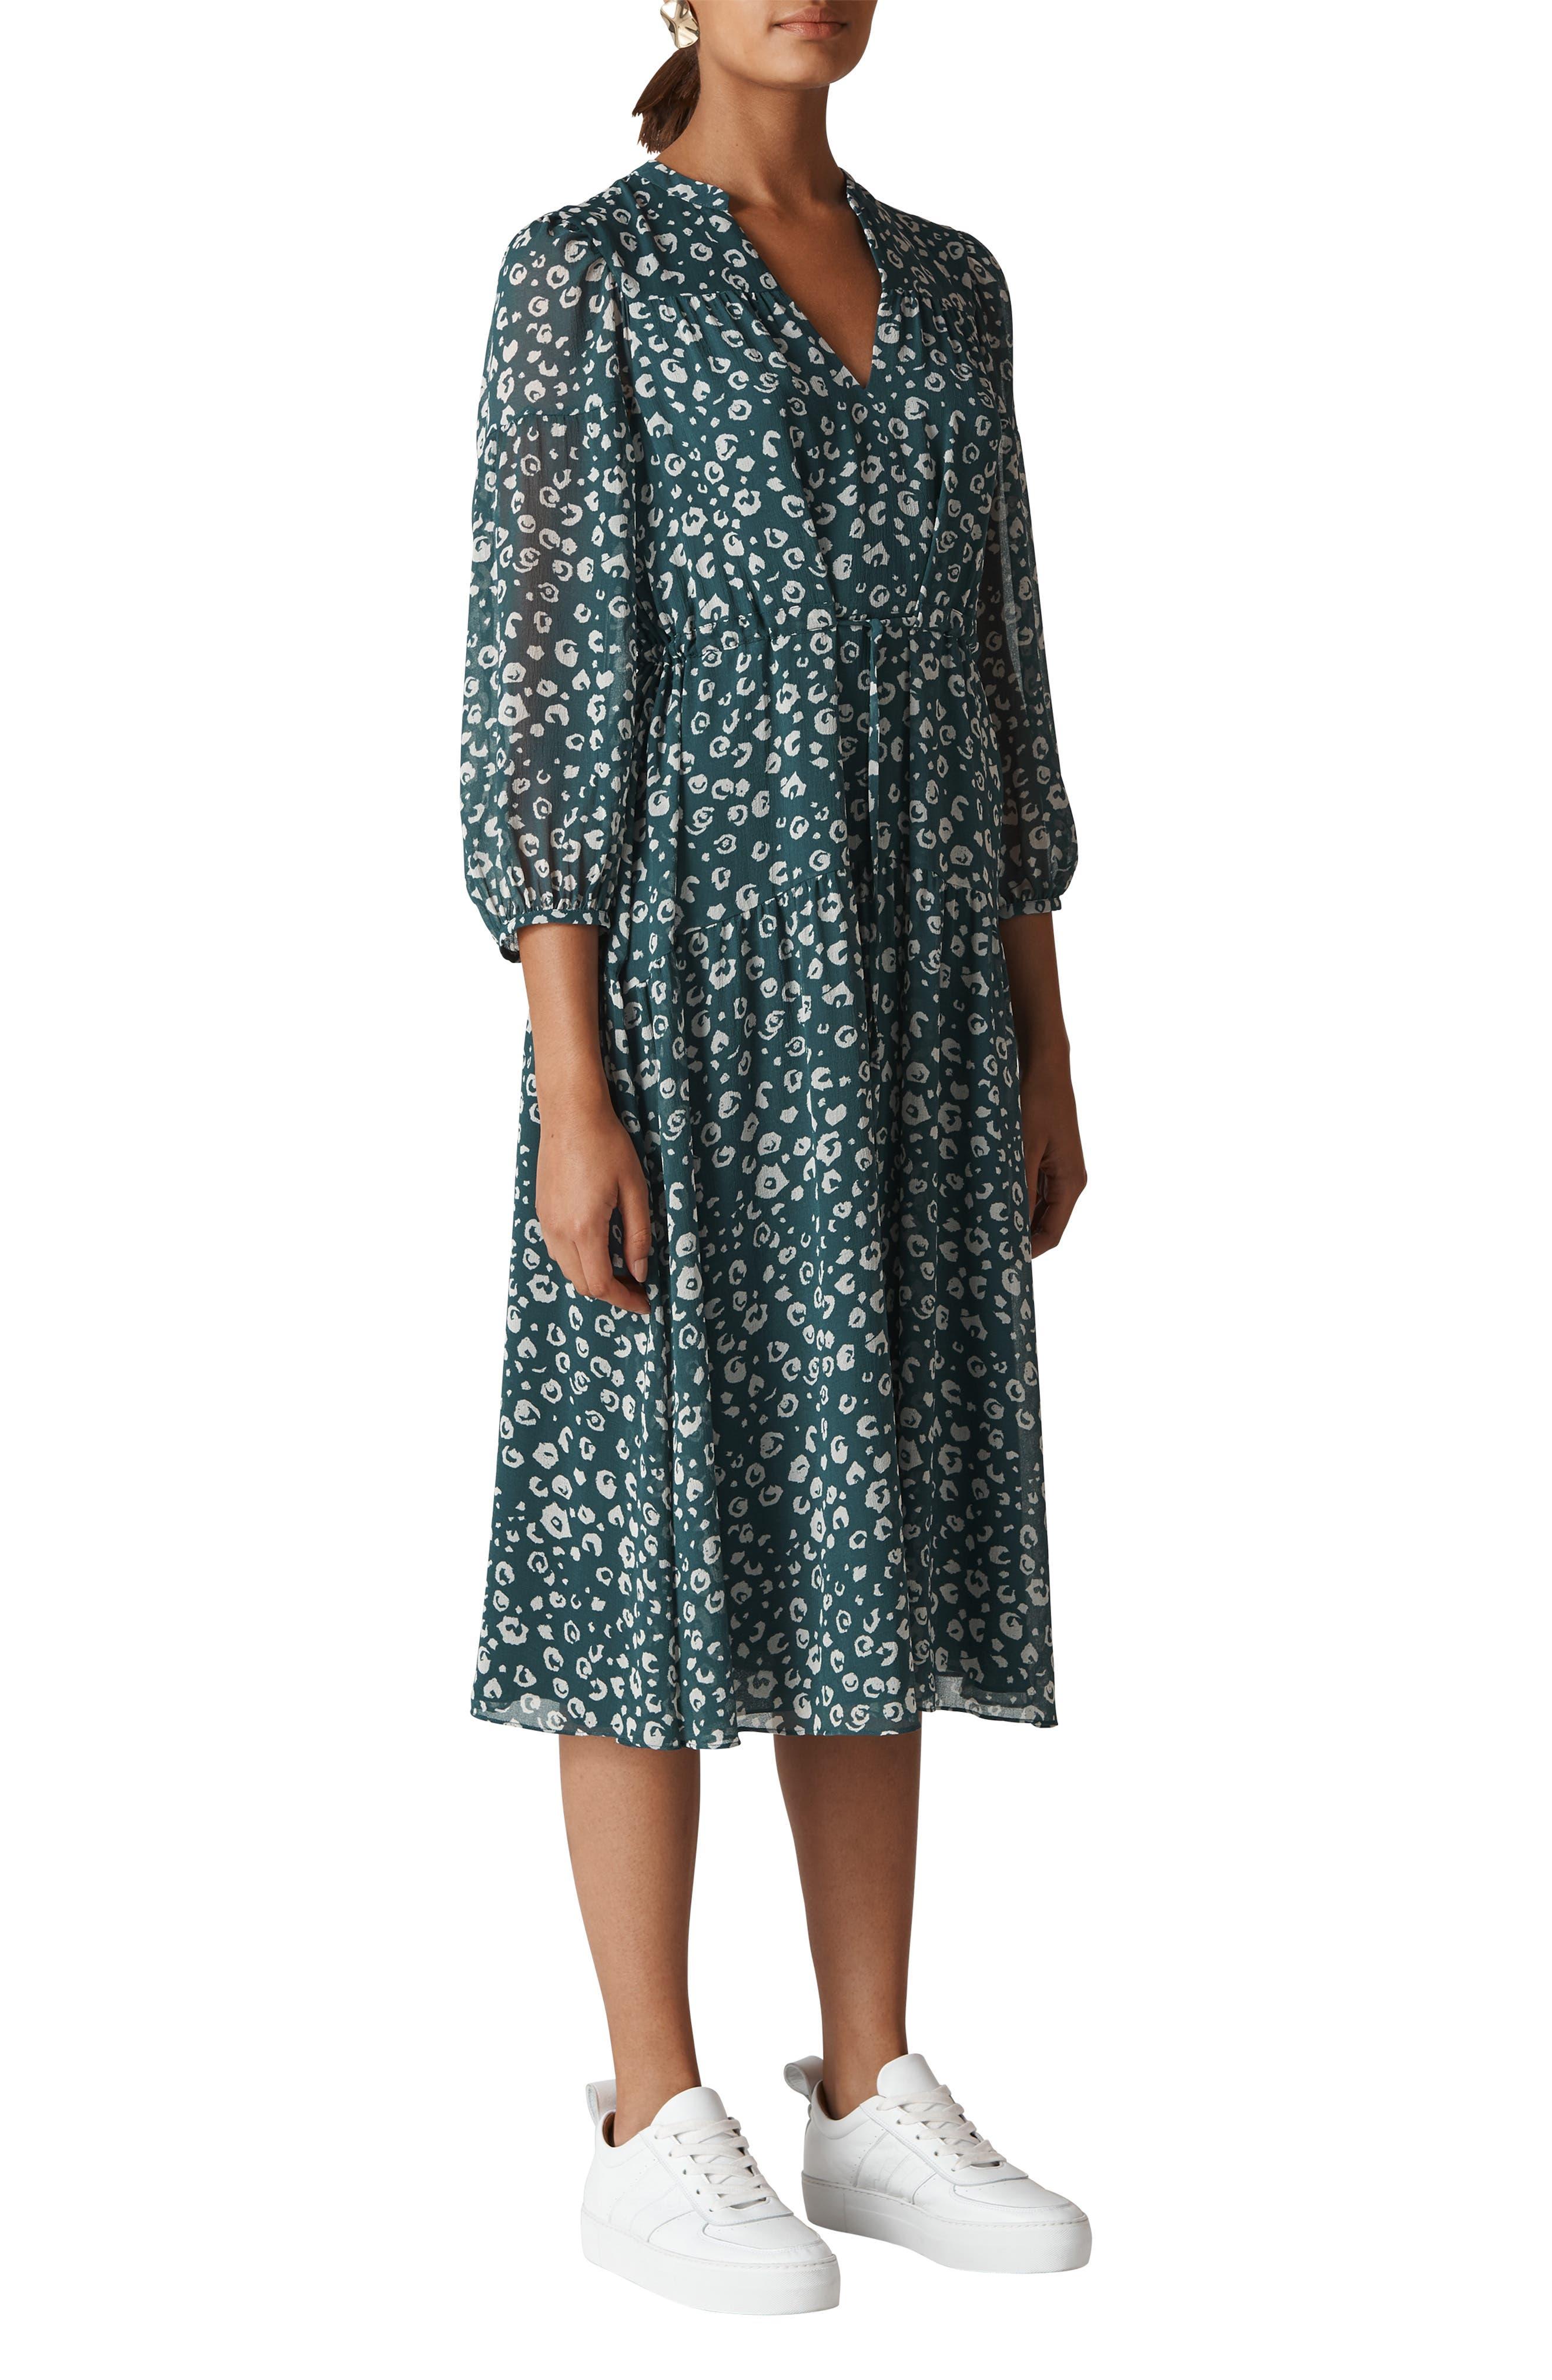 Adrianna Cheetah Print Midi Dress,                             Main thumbnail 1, color,                             GREEN/ MULTI